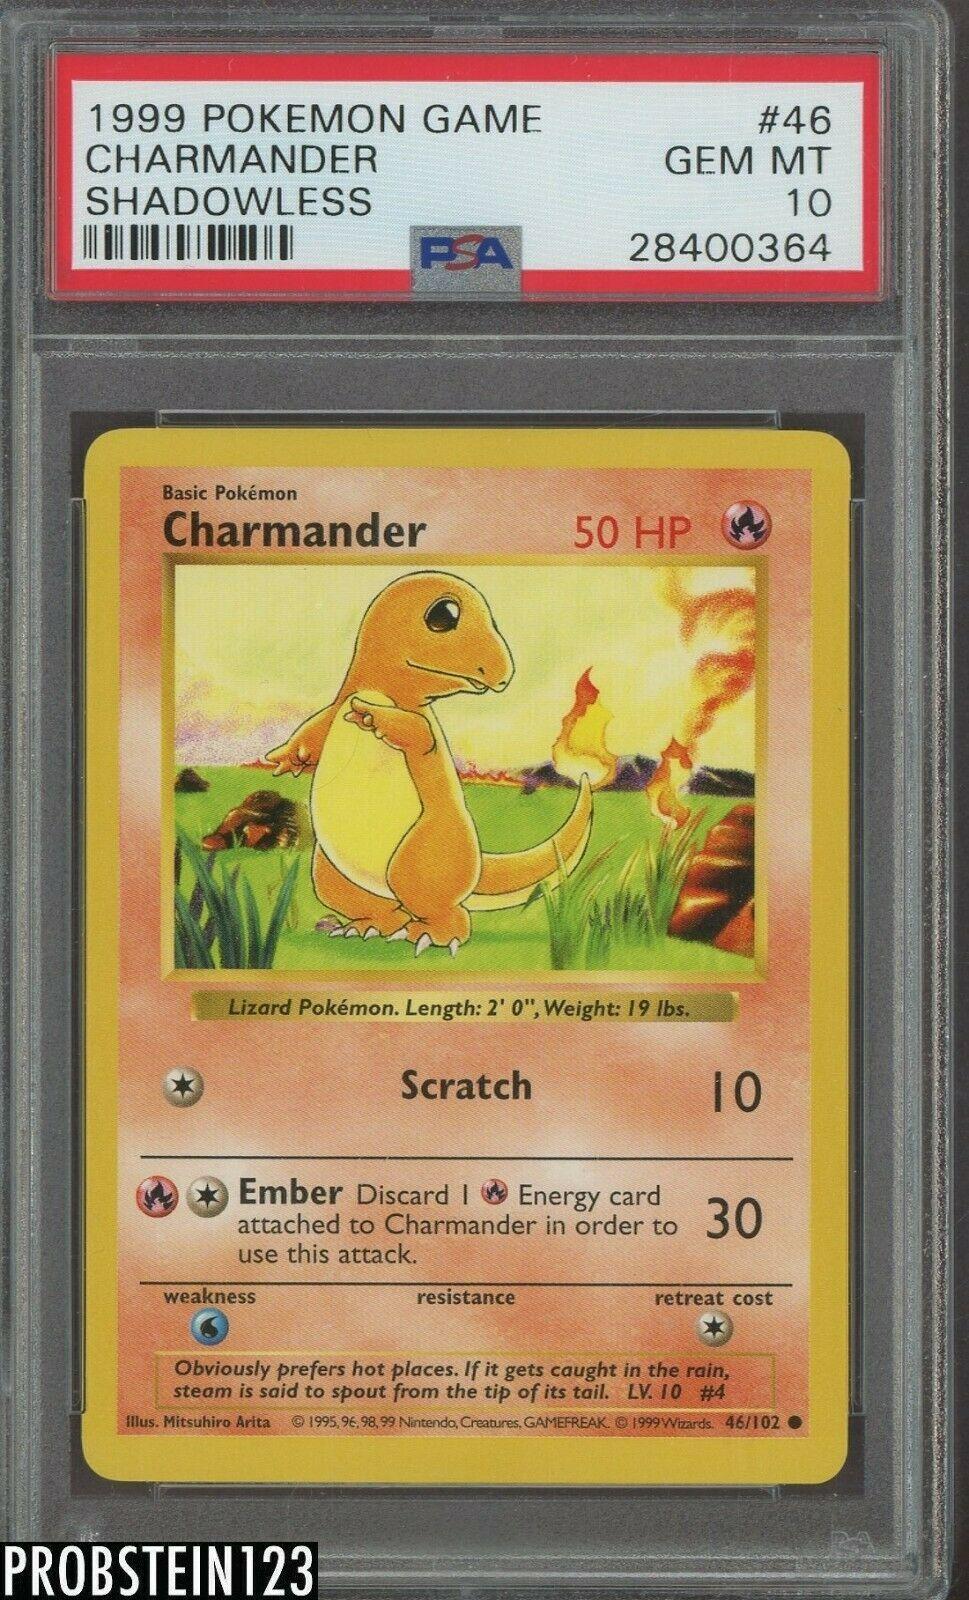 1999 Pokemon Game Shadowless 46 Charmander PSA 10 GEM MINT